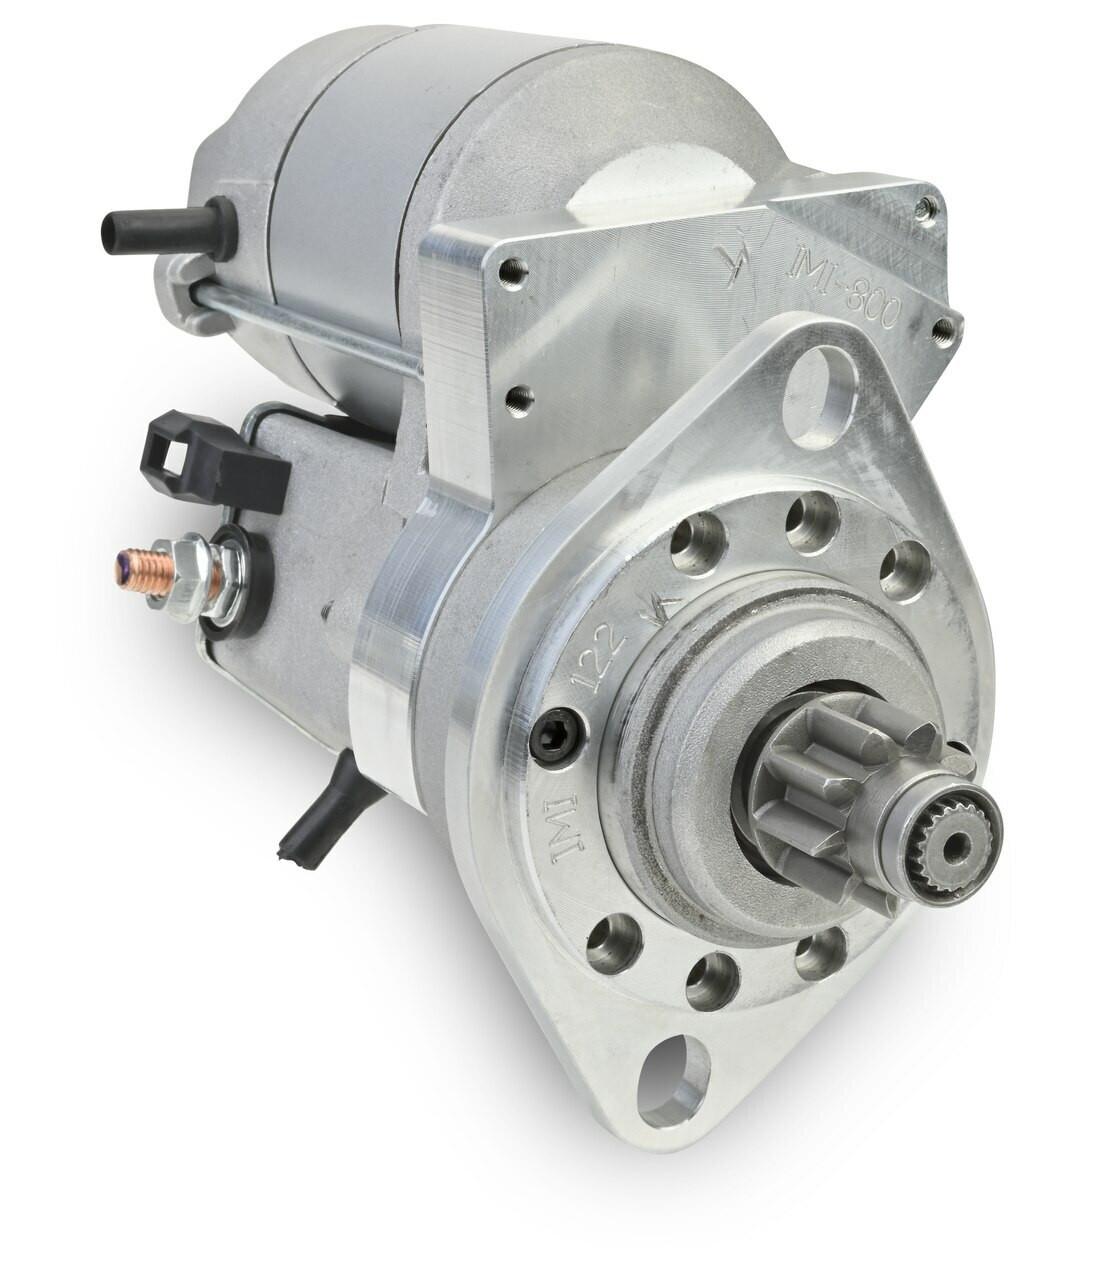 1934-1937 Chevrolet gear reduction starter-738GGR